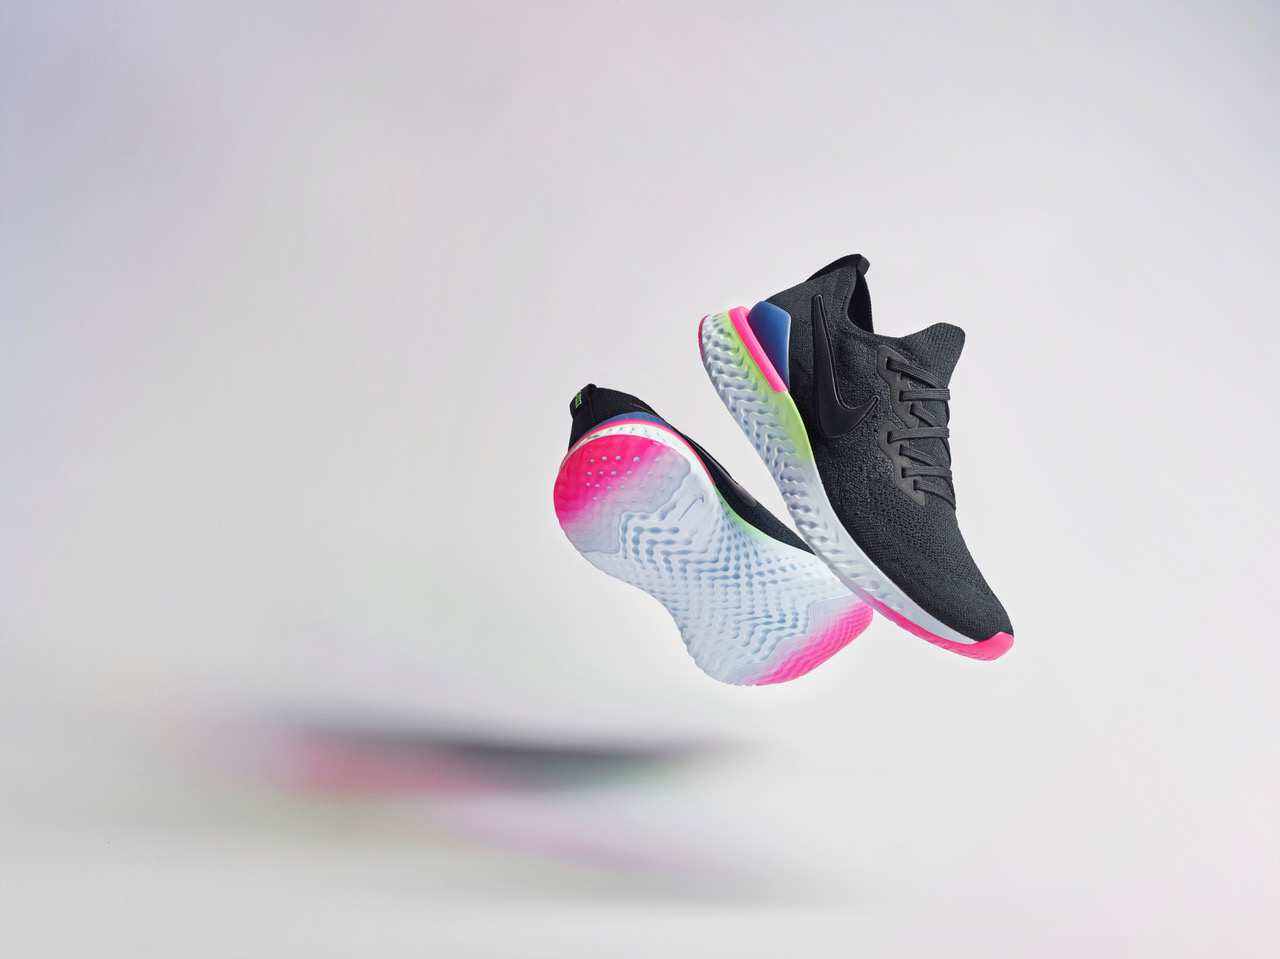 Nuovo look per Nike Epic React Flyknit 2: ancora più morbida